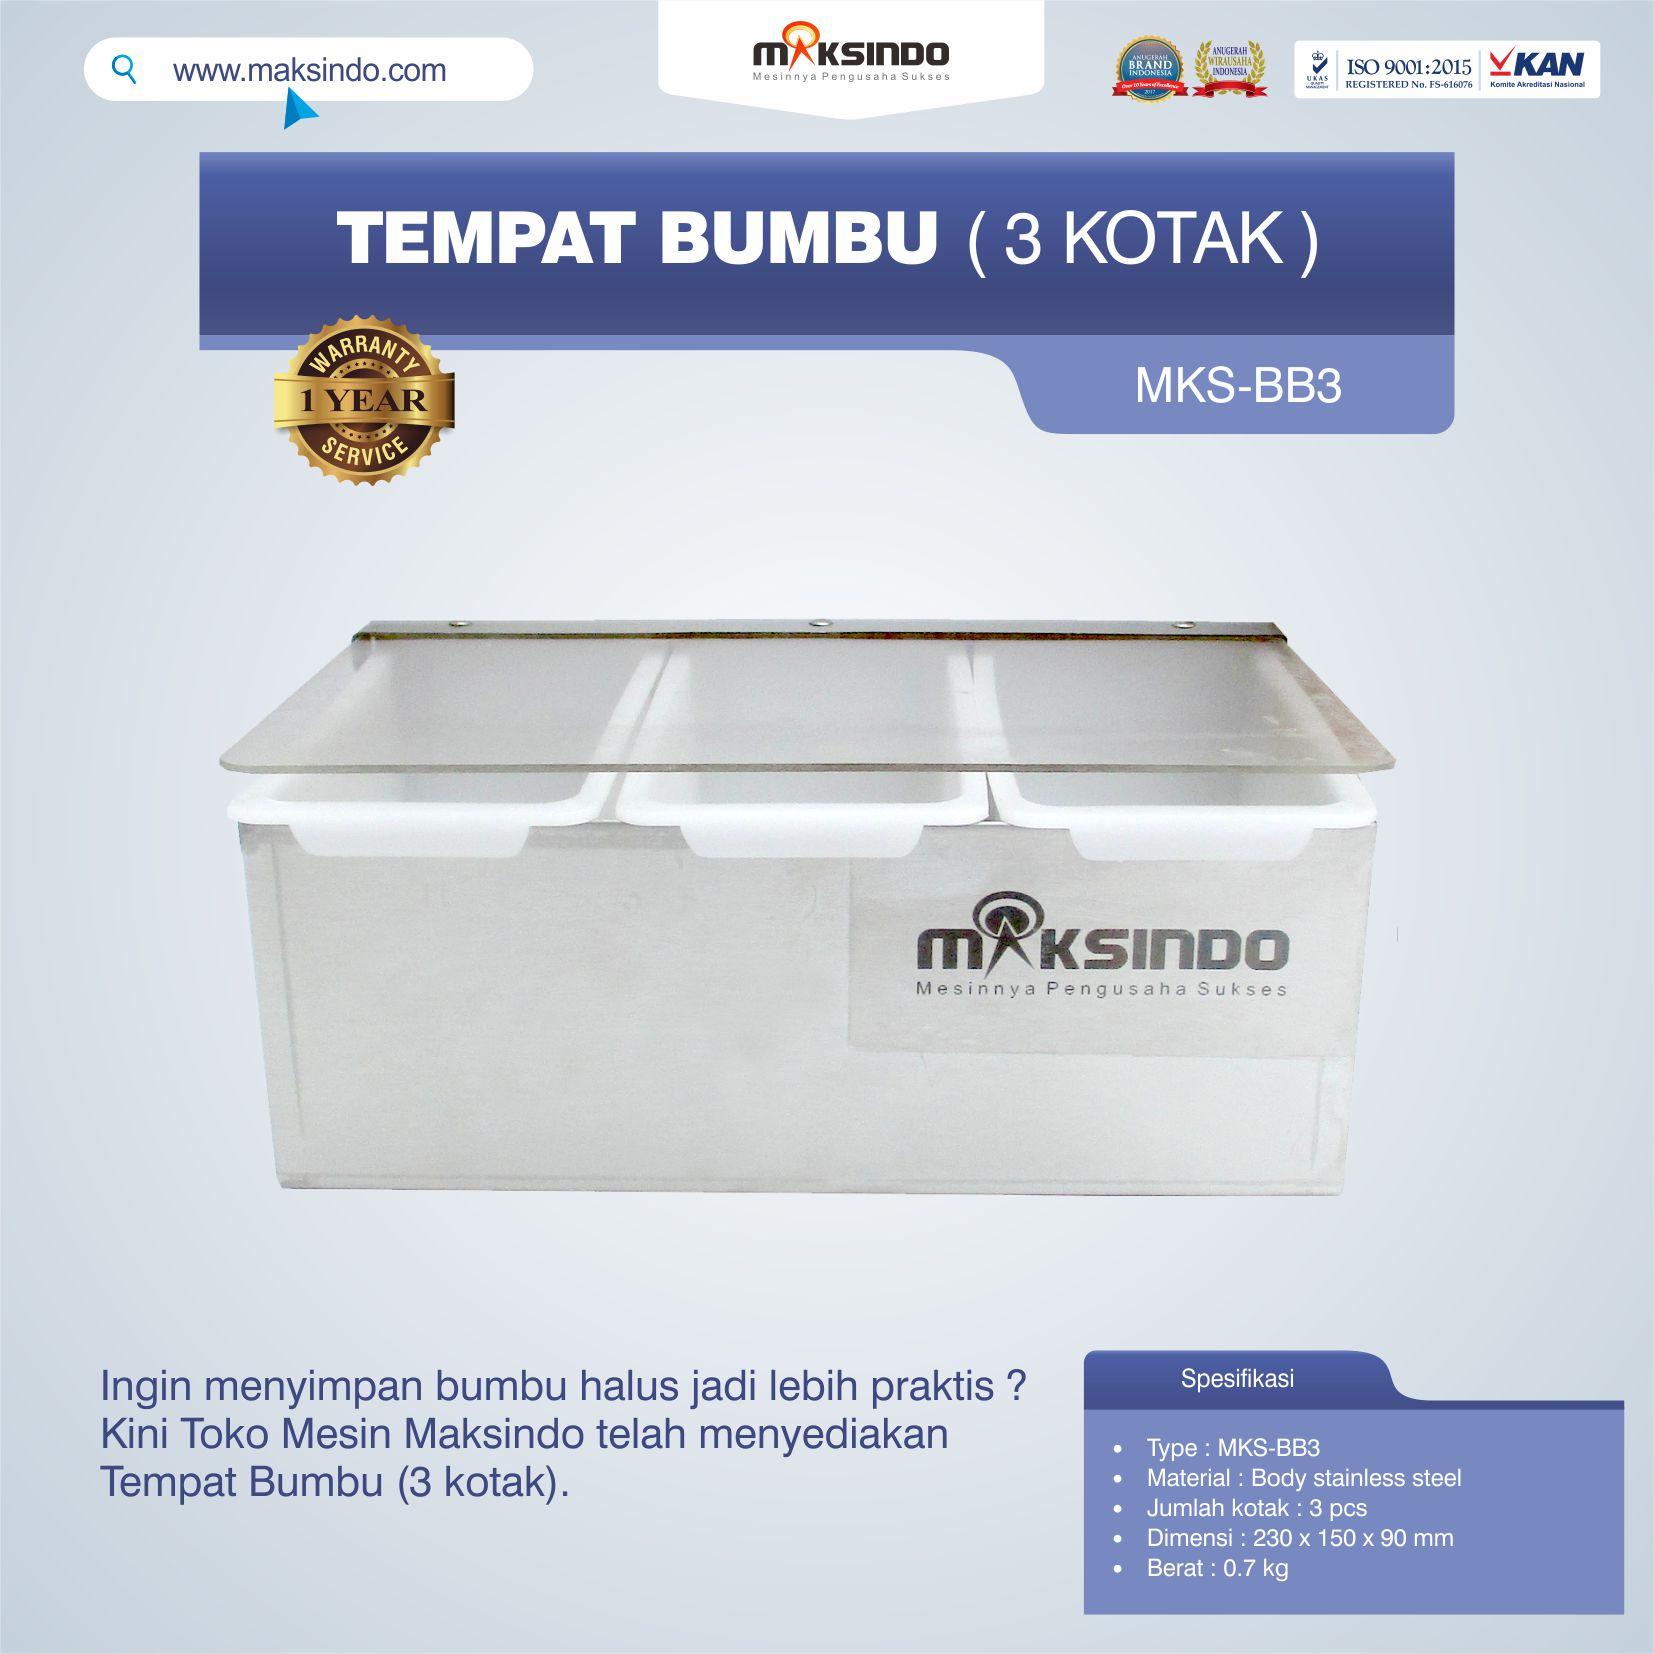 Jual Tempat Bumbu (3 kotak) di Jakarta